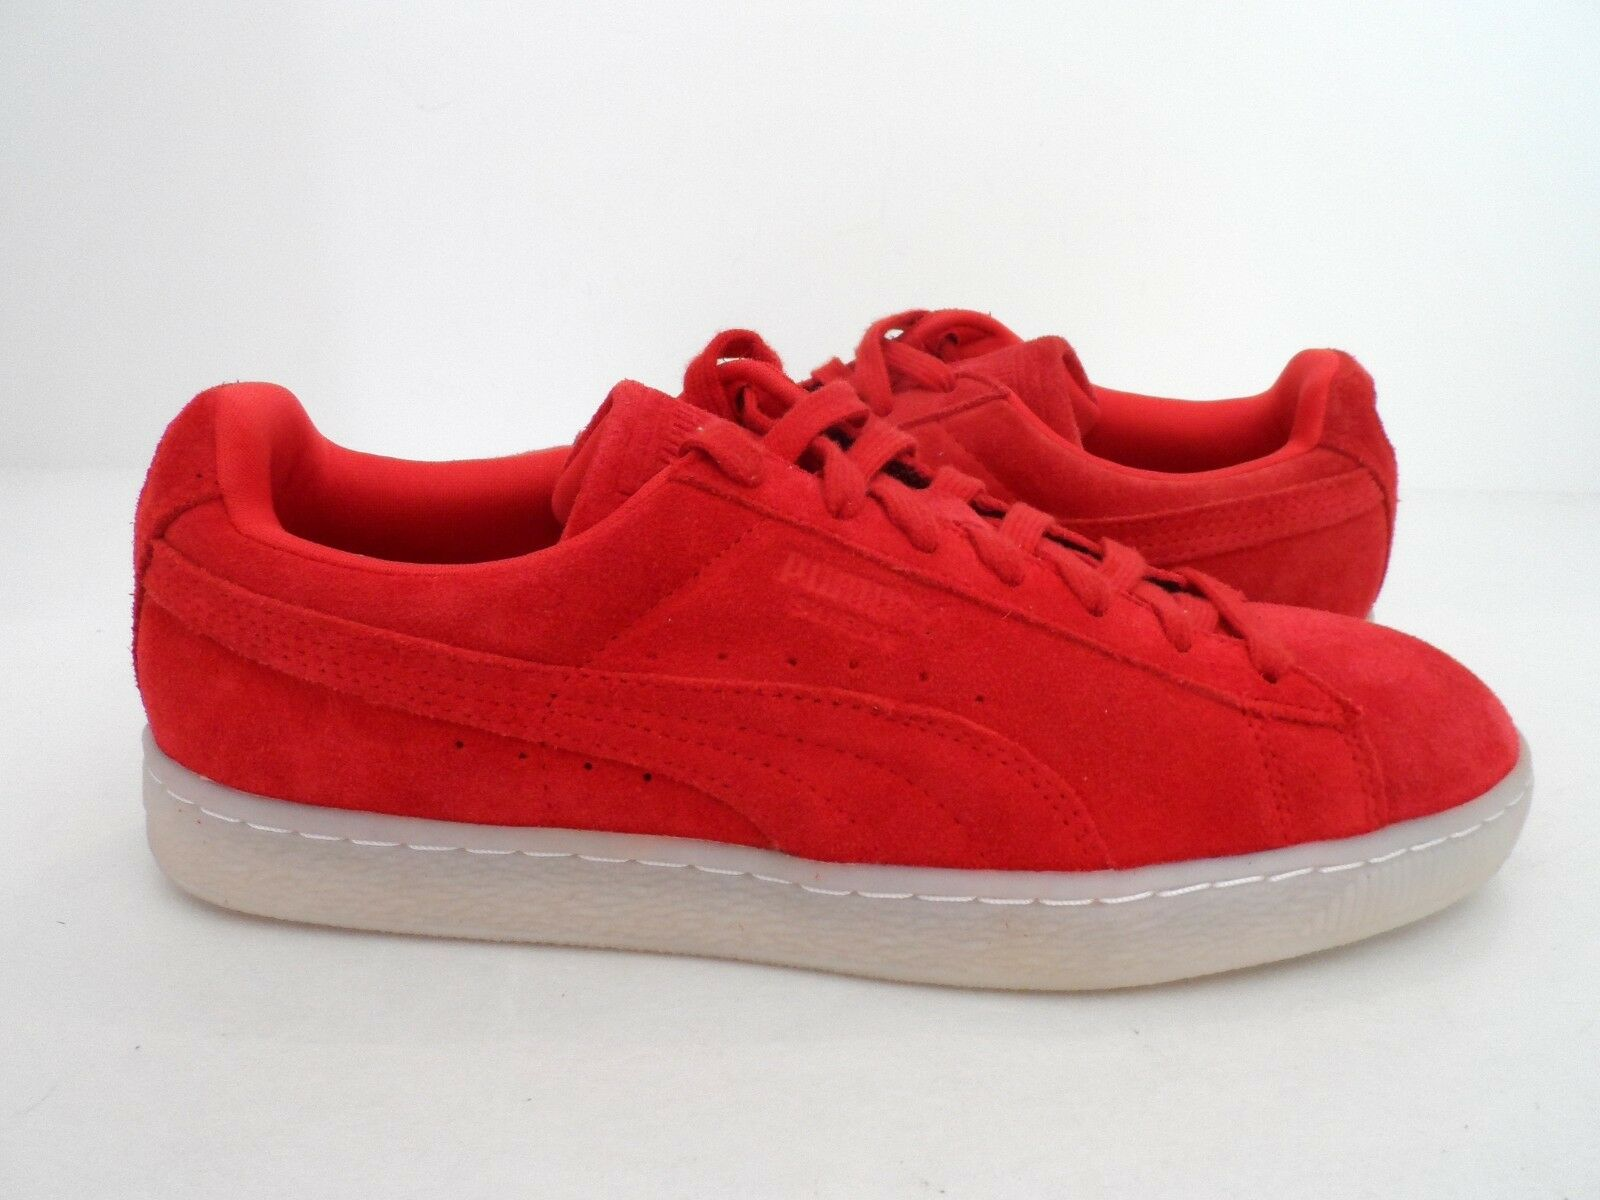 Puma camoscio color color camoscio rosso classico Uomo scarpe taglia 9 0b19d7